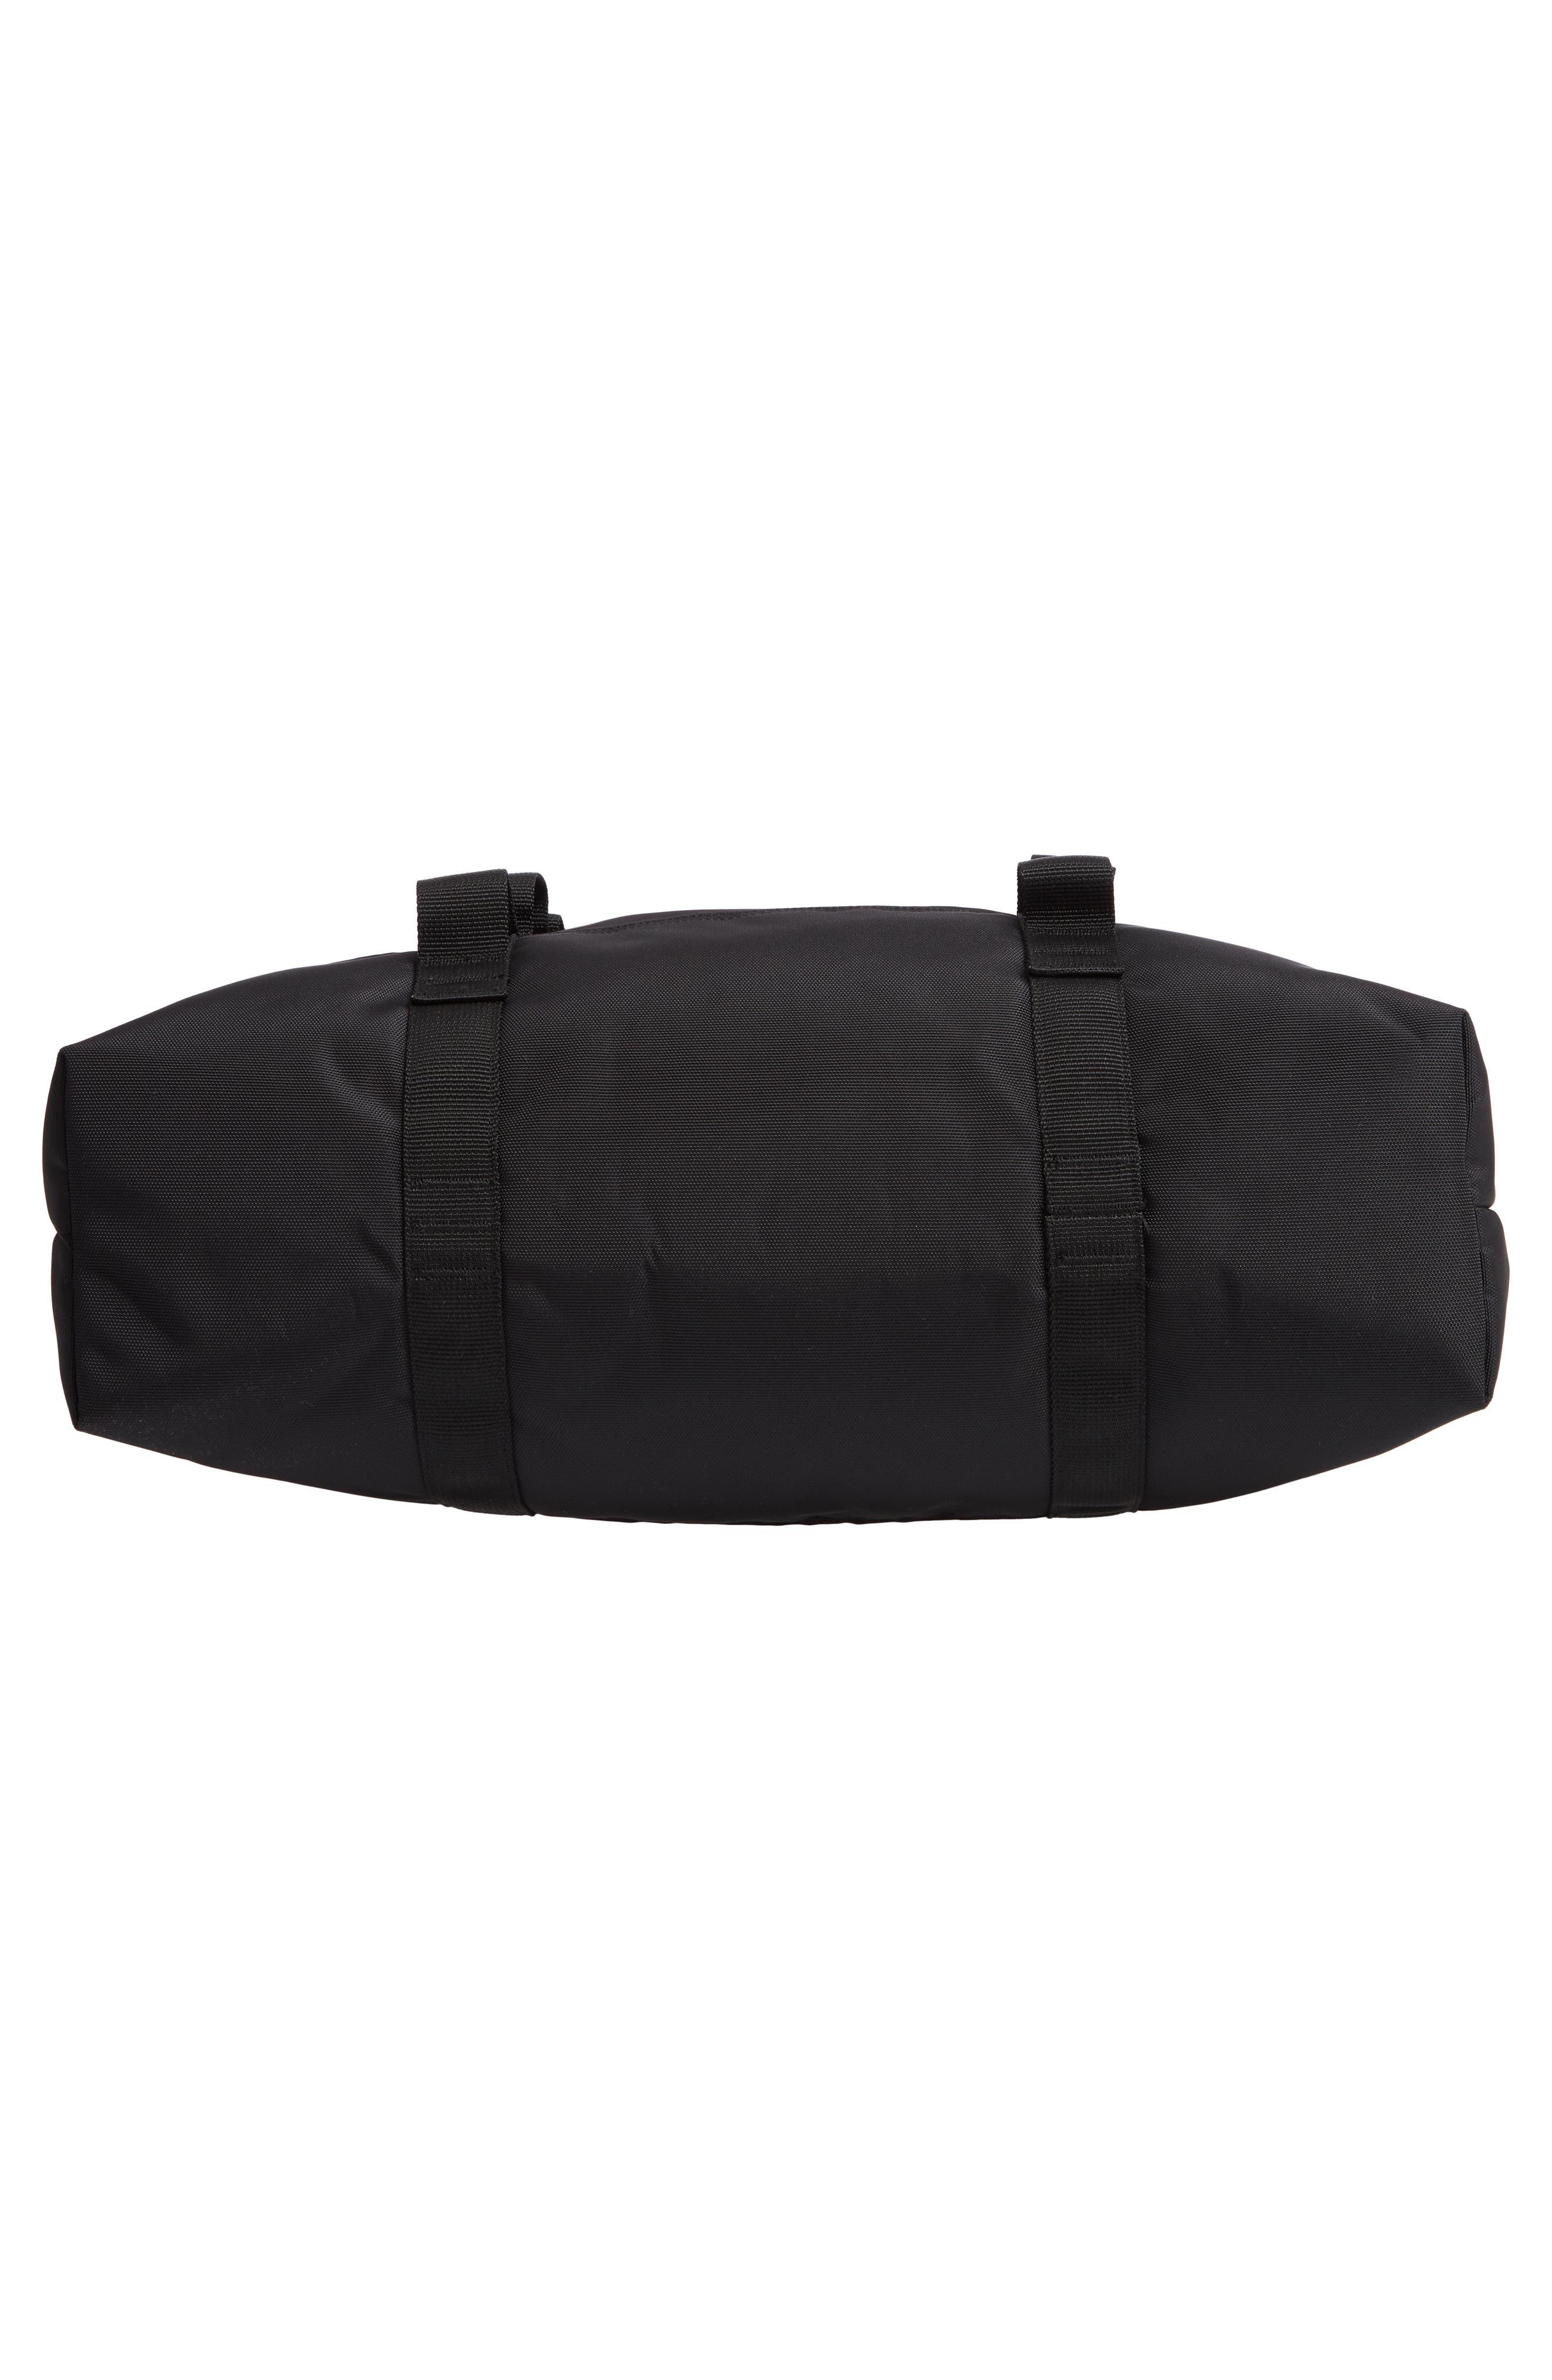 Military Shopper Tote Bag,                             Alternate thumbnail 6, color,                             001